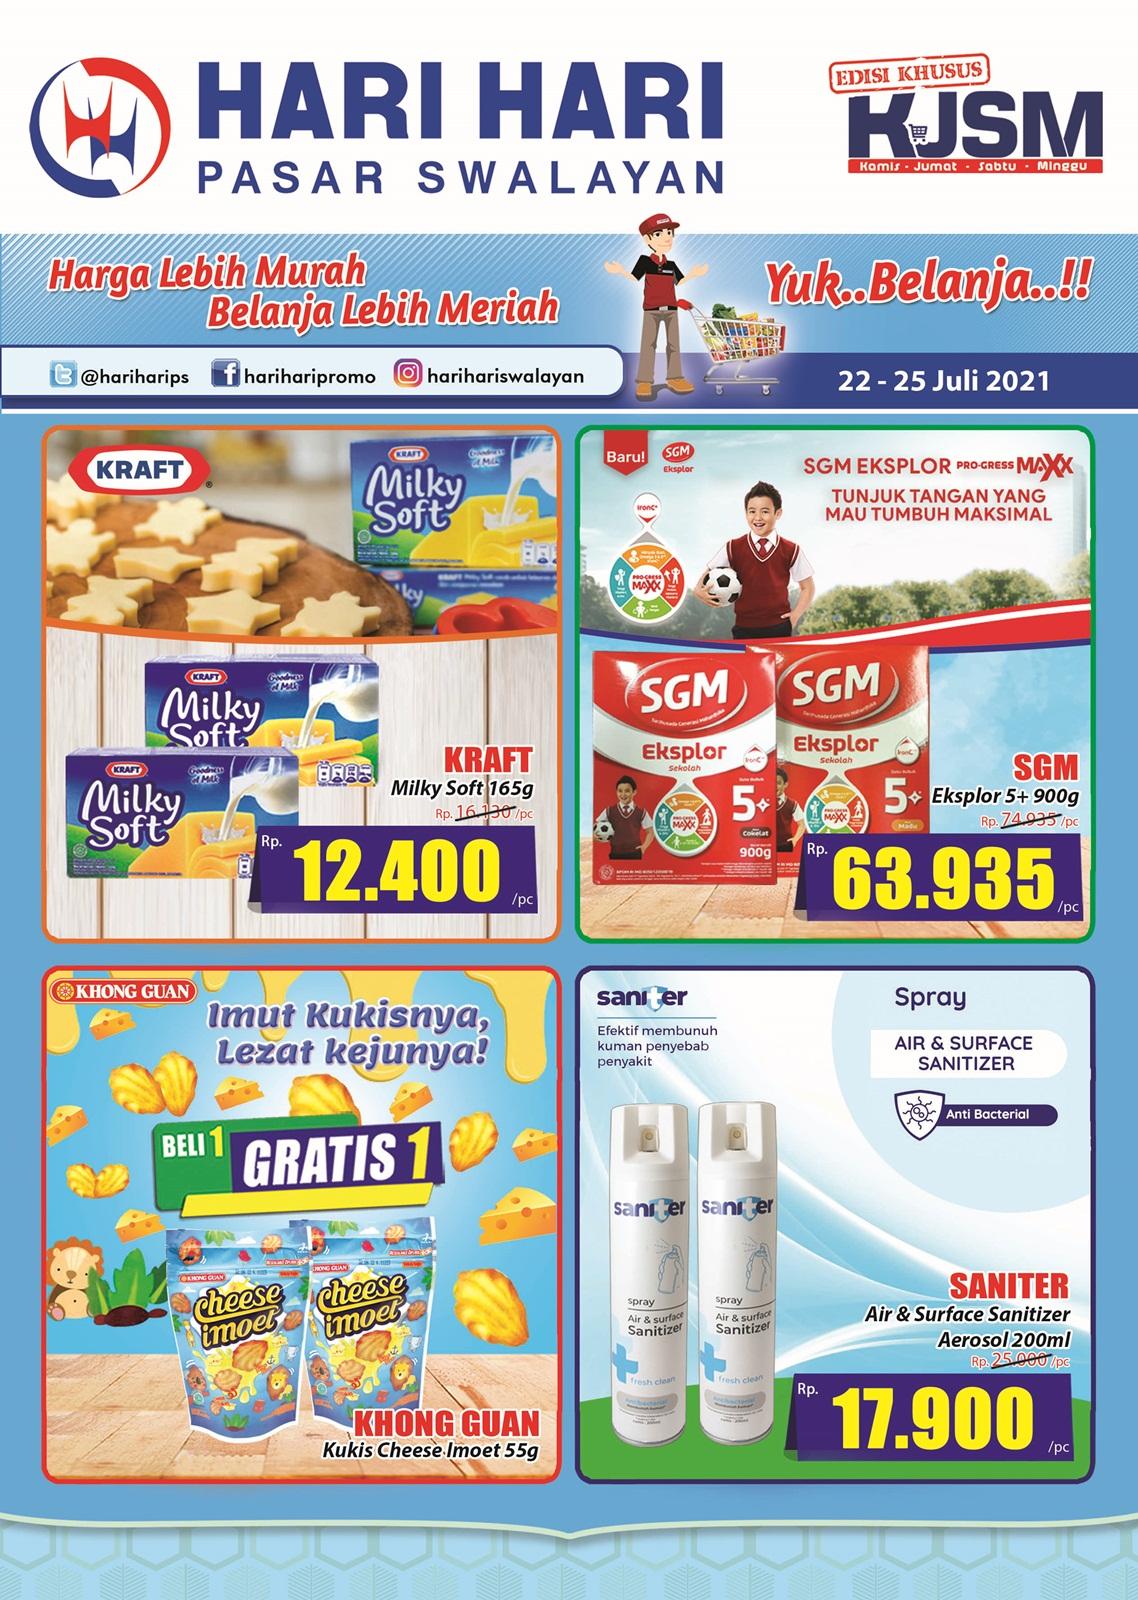 Promo Hari Hari Pasar Swalayan Weekend JSM Periode 22-25 Juli 2021